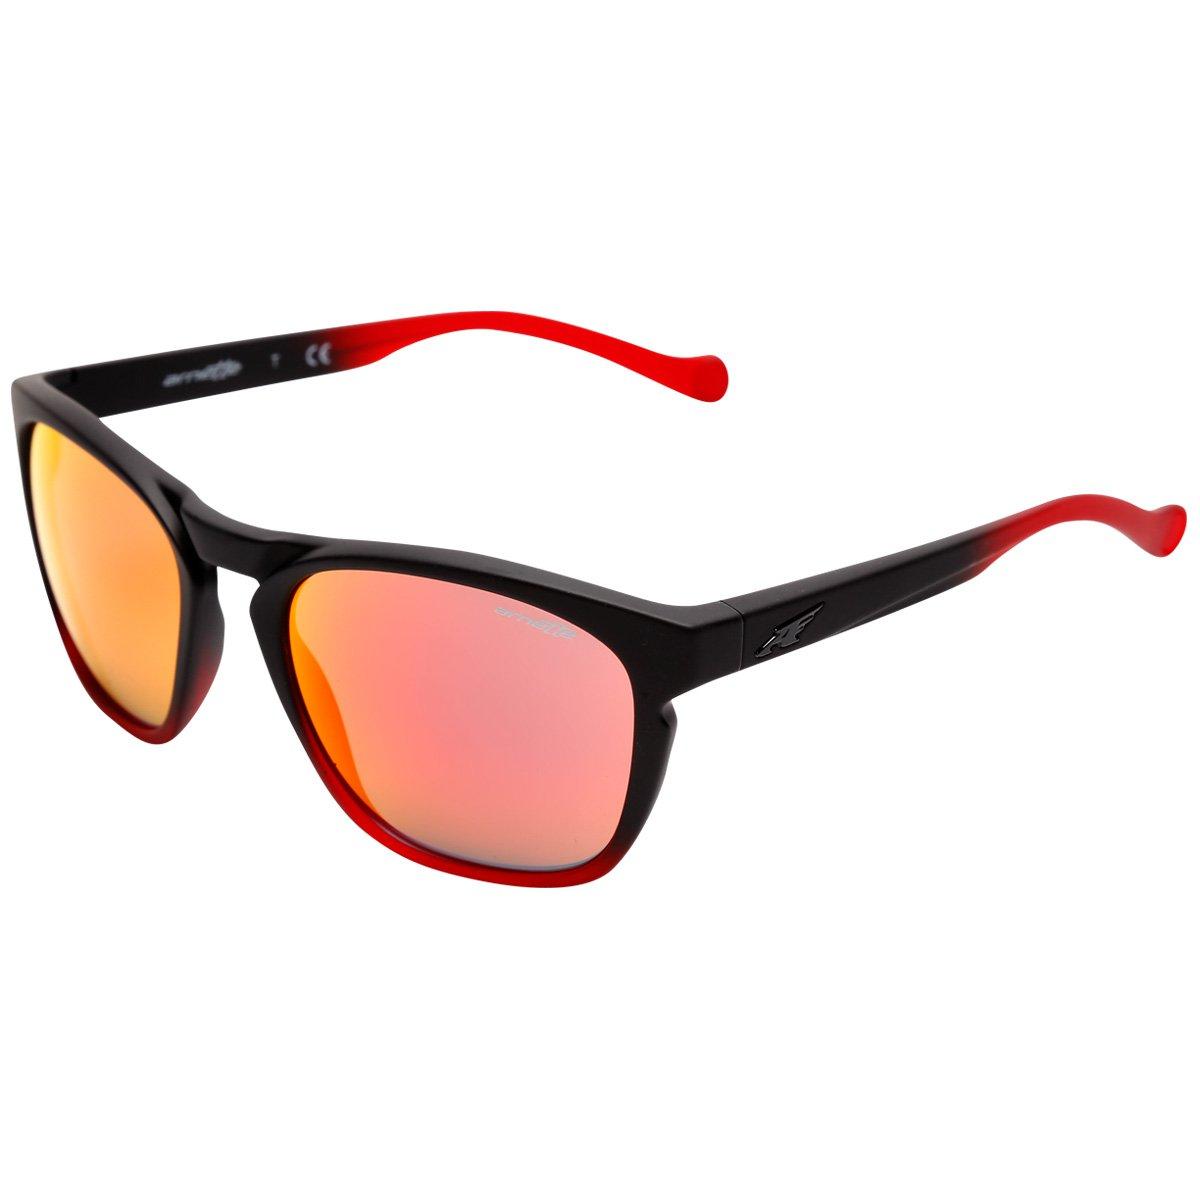 3422636cc1516 Óculos Arnette Groove - Compre Agora